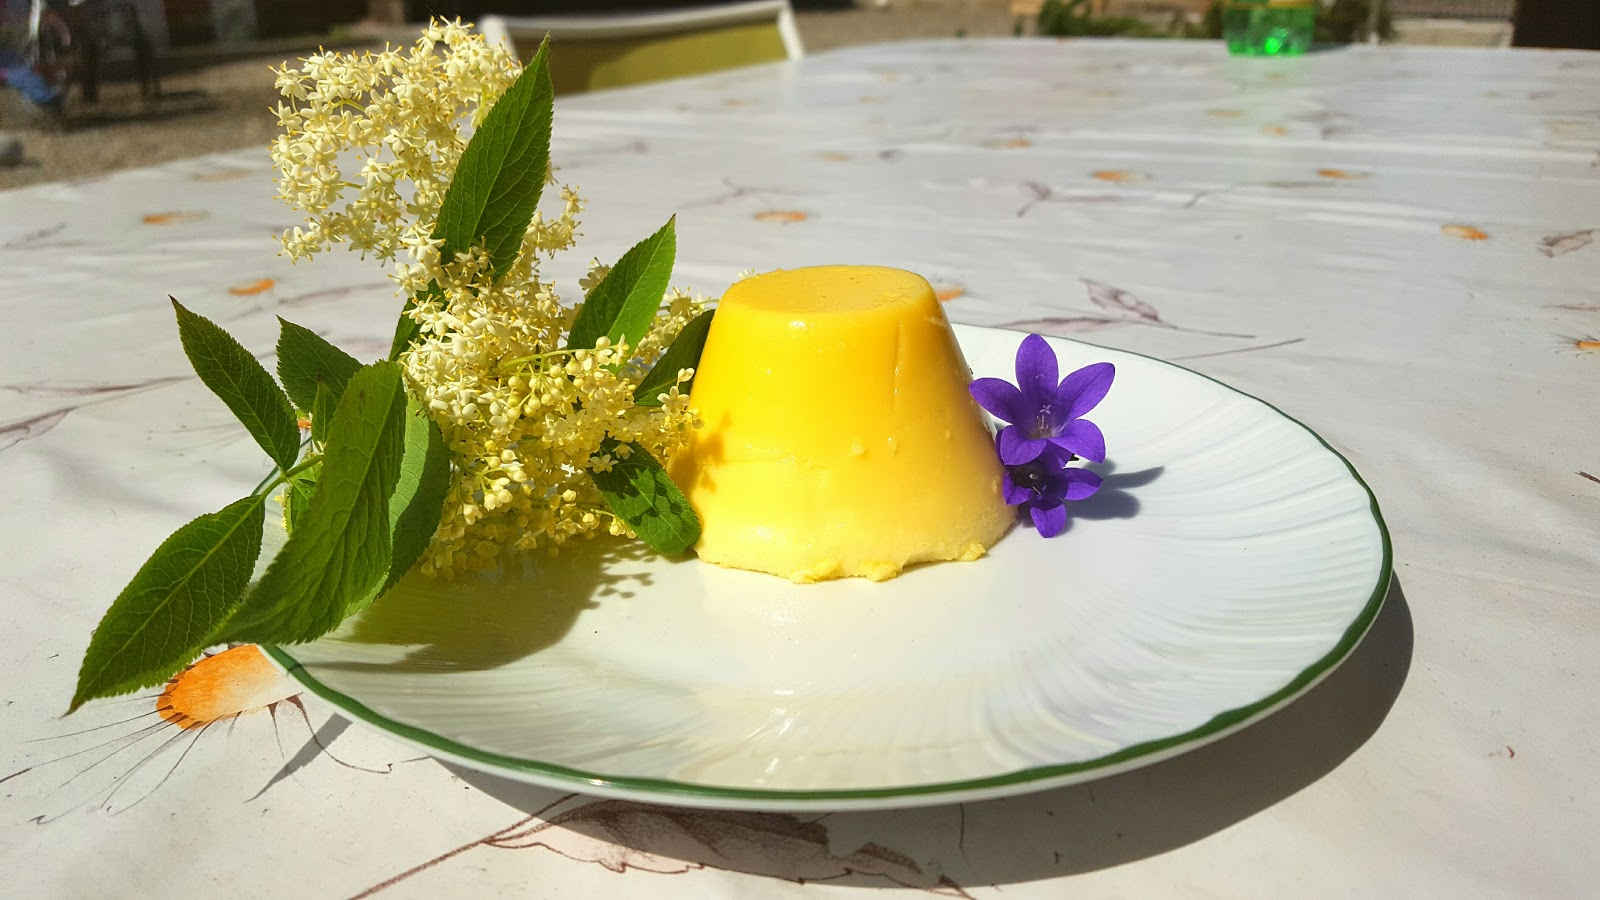 Cucina spartana - Cucina fanpage facebook ...